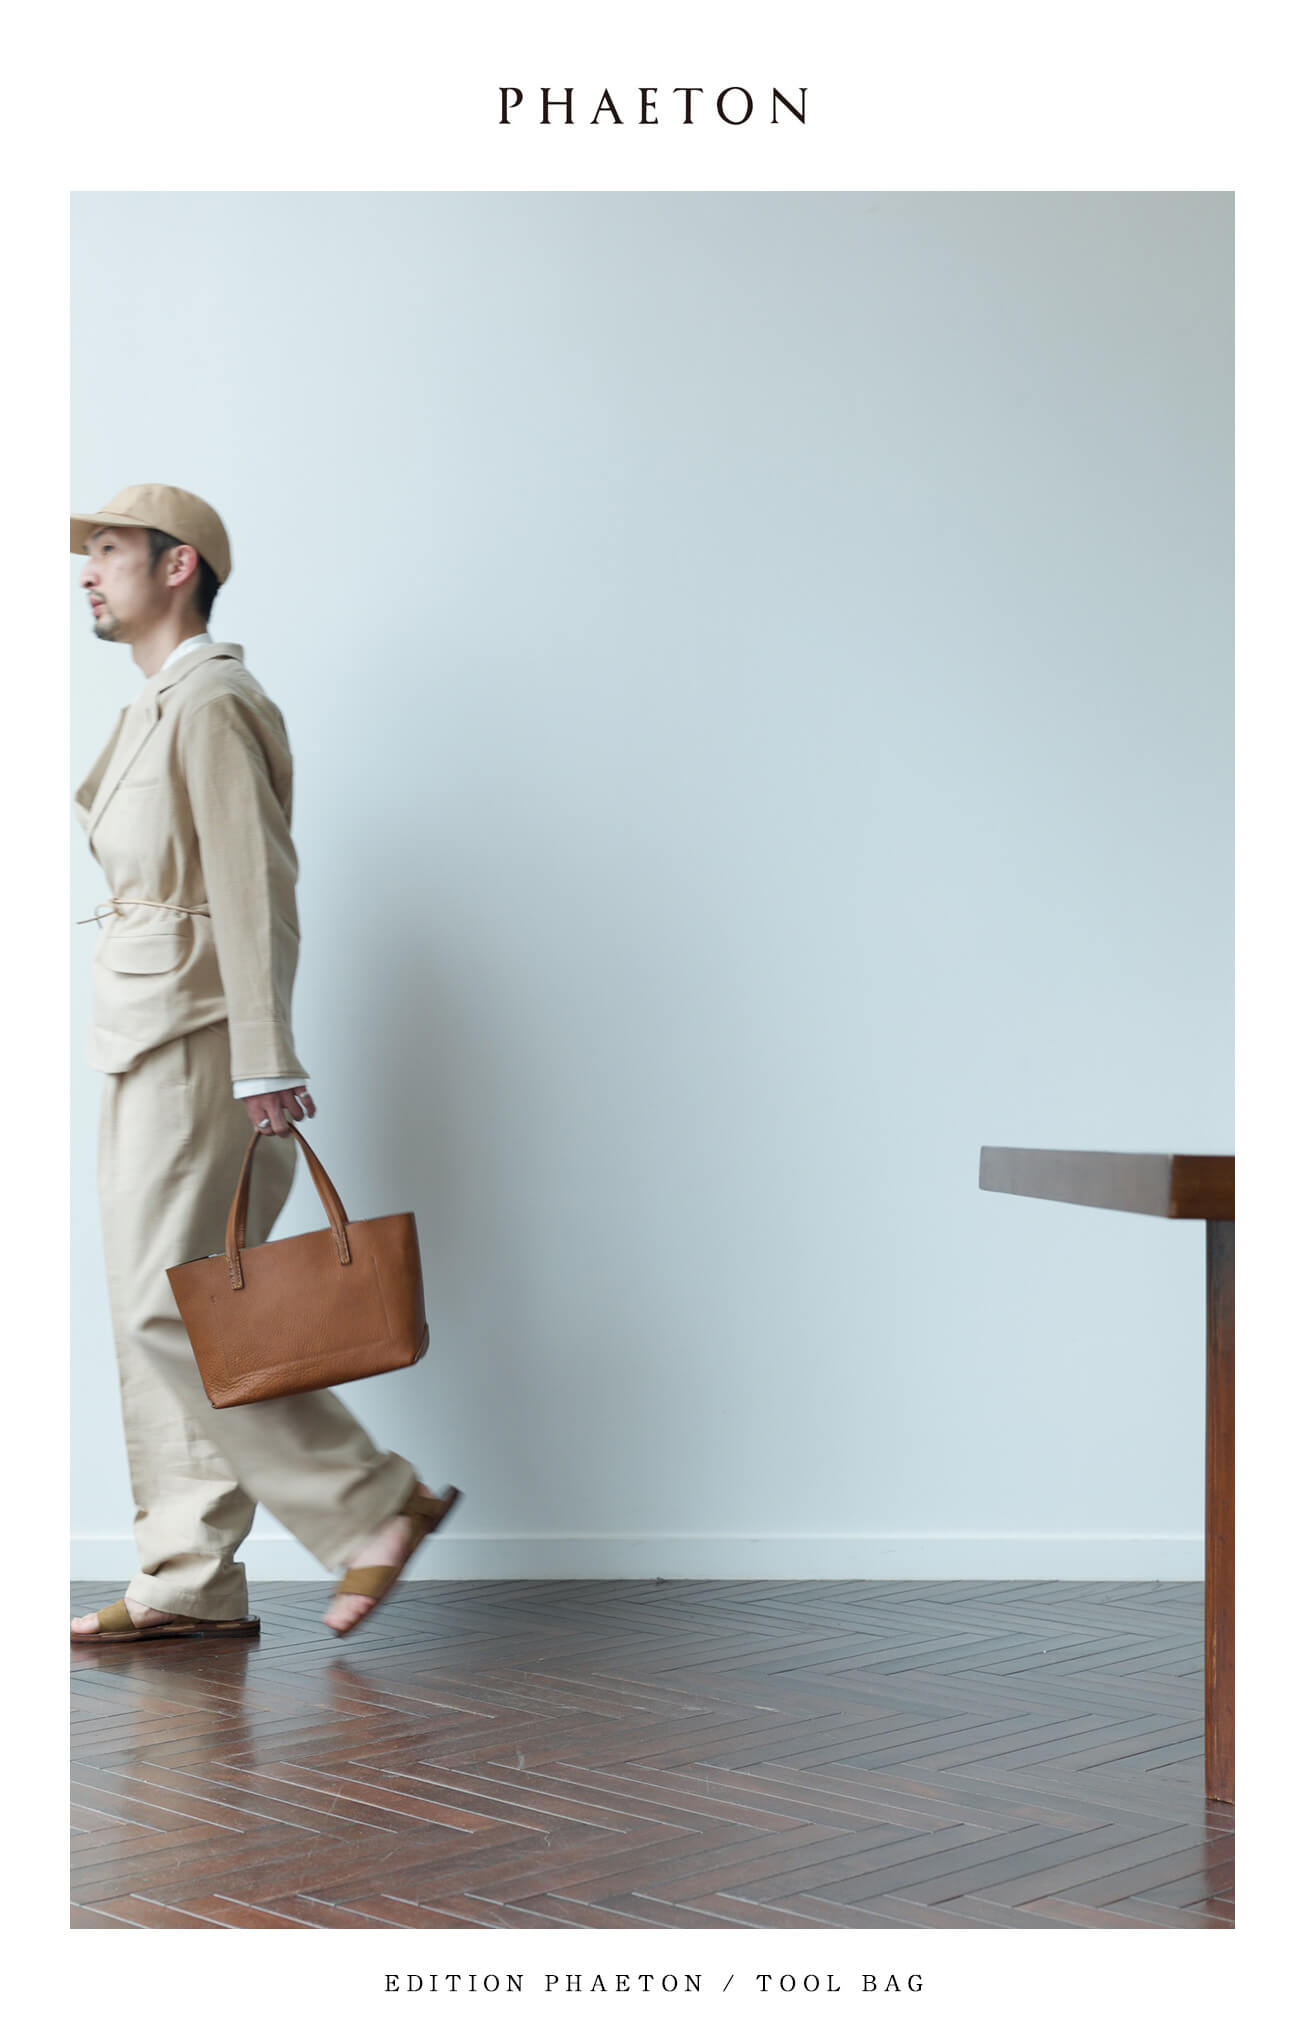 editionphaeton-toolbag10